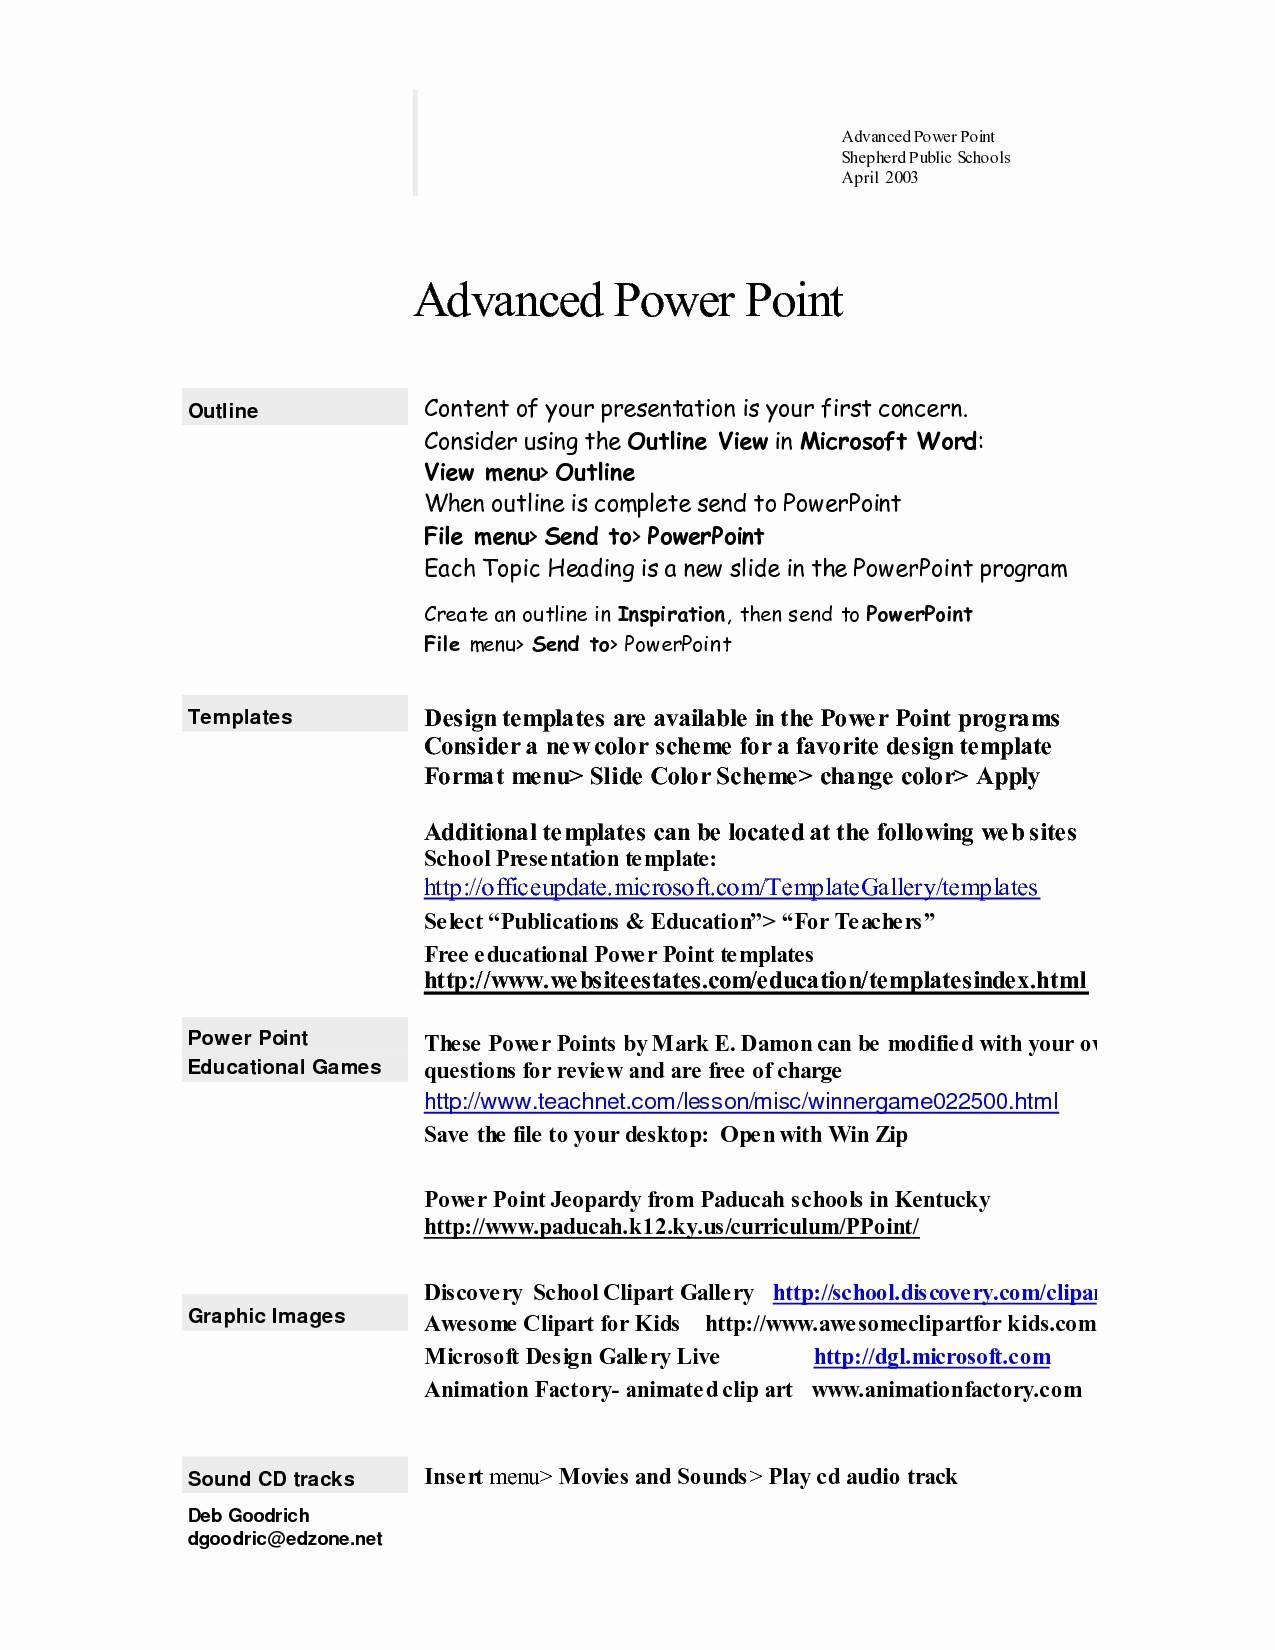 Free Resume Templates 2017 Word New Free Word Resume Templates 2017